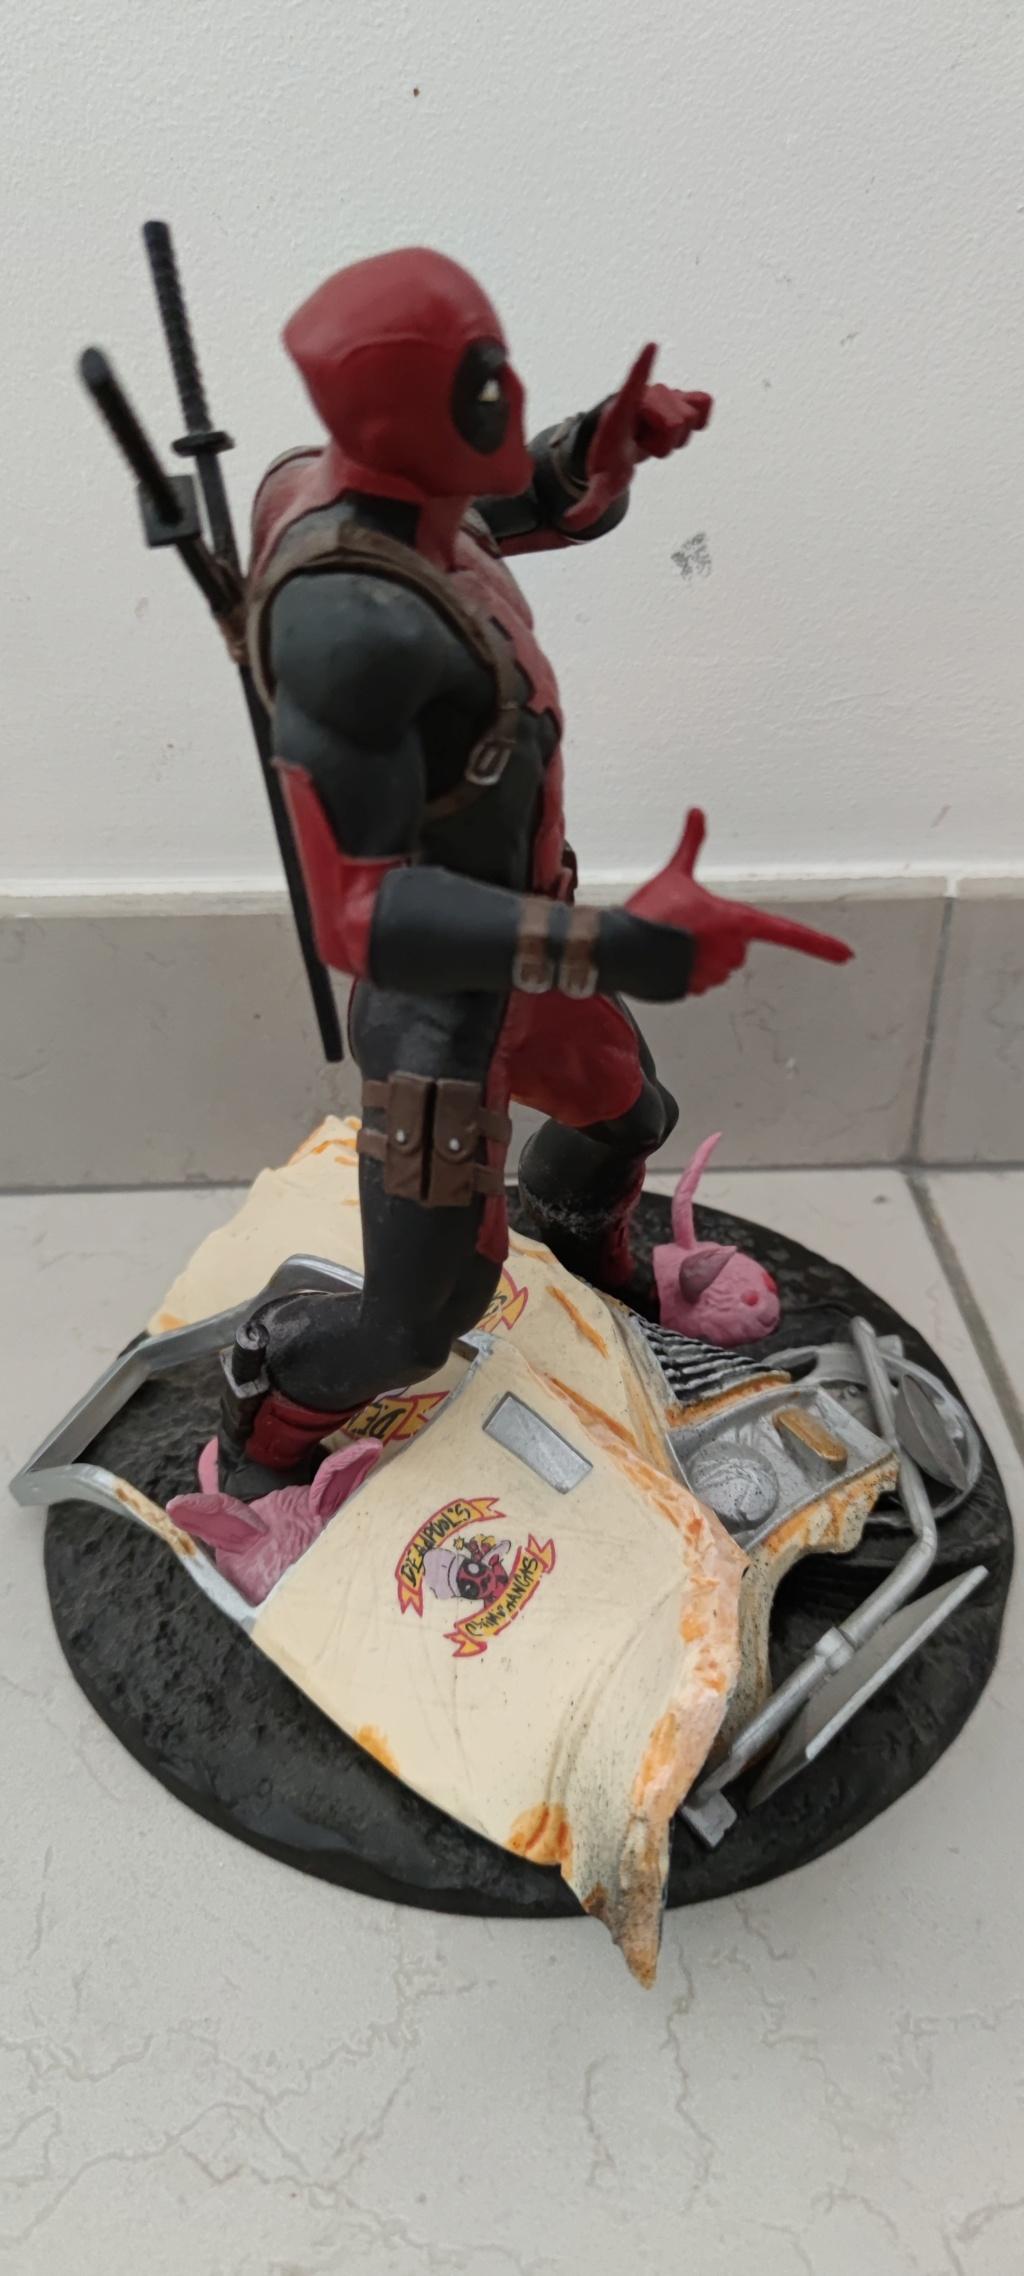 [VDS] Figurines Dragon Ball, One piece, Naruto, Megaman etc....  16162422